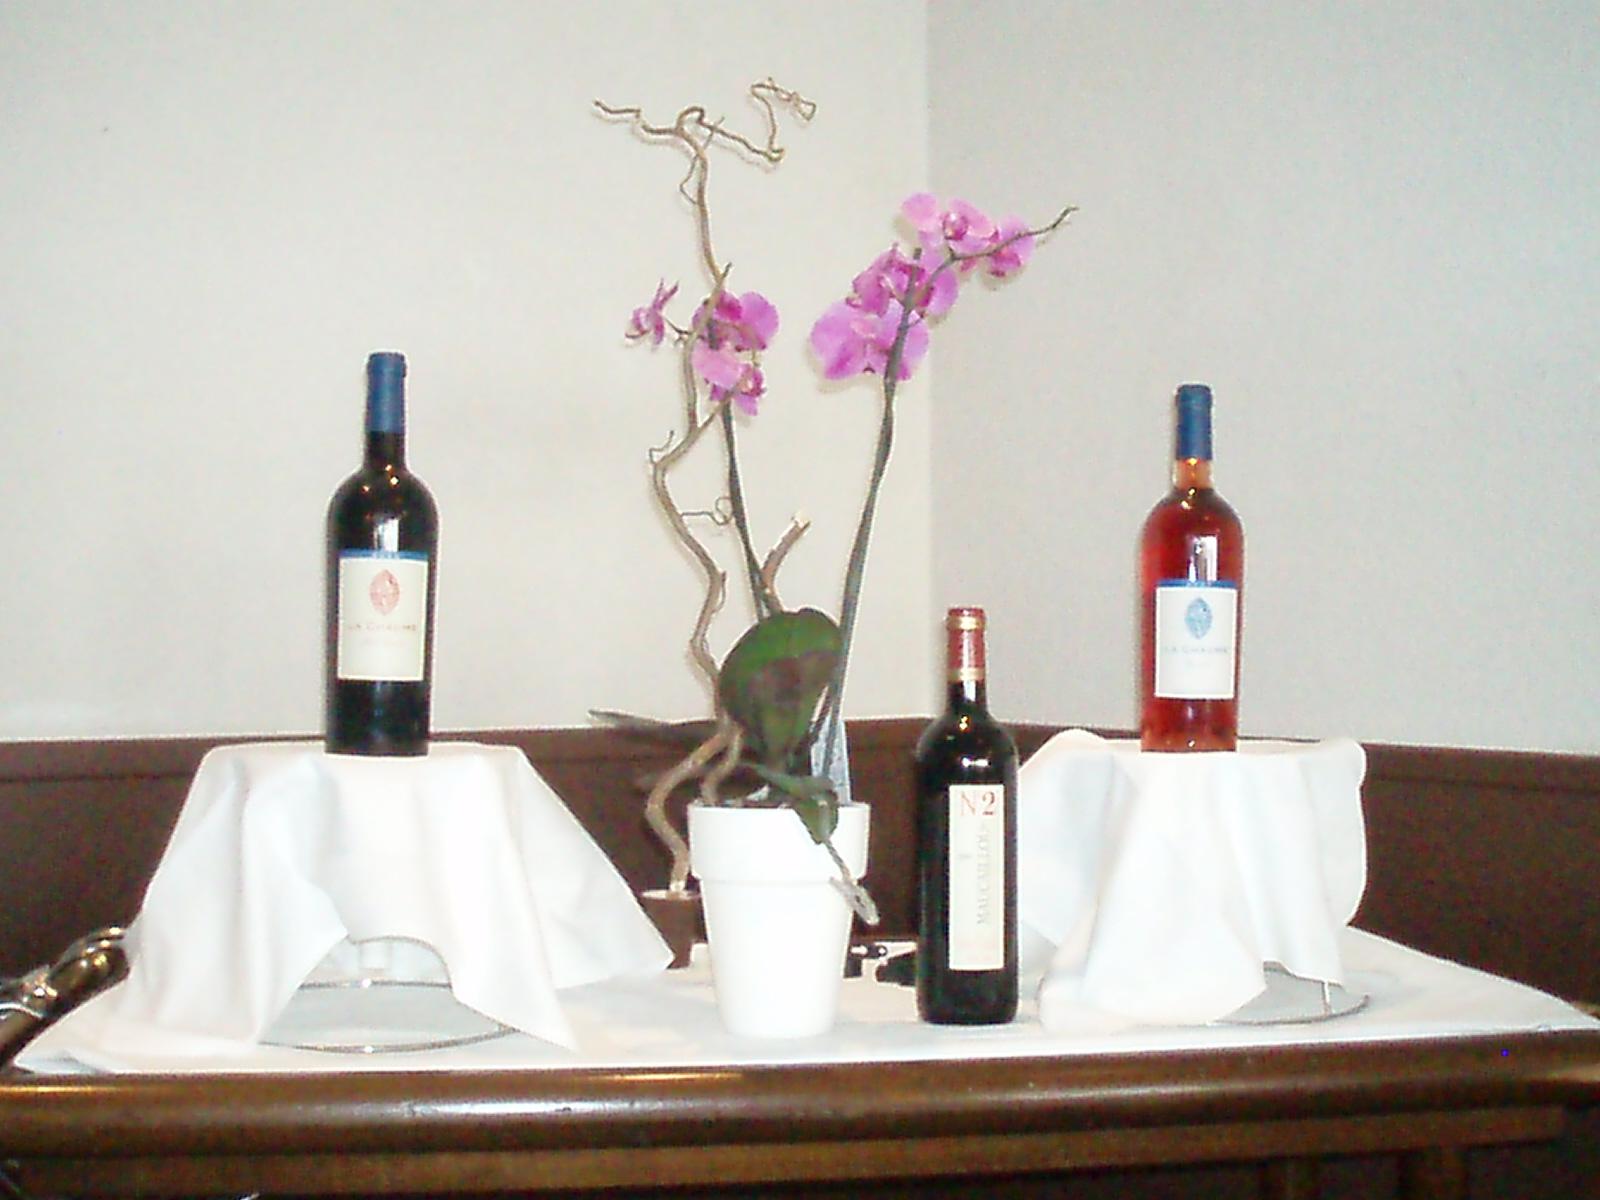 Restaurant St Trop' Café Sainte genevi u00e8ve des bois # Restaurant La Grange Sainte Geneviève Des Bois